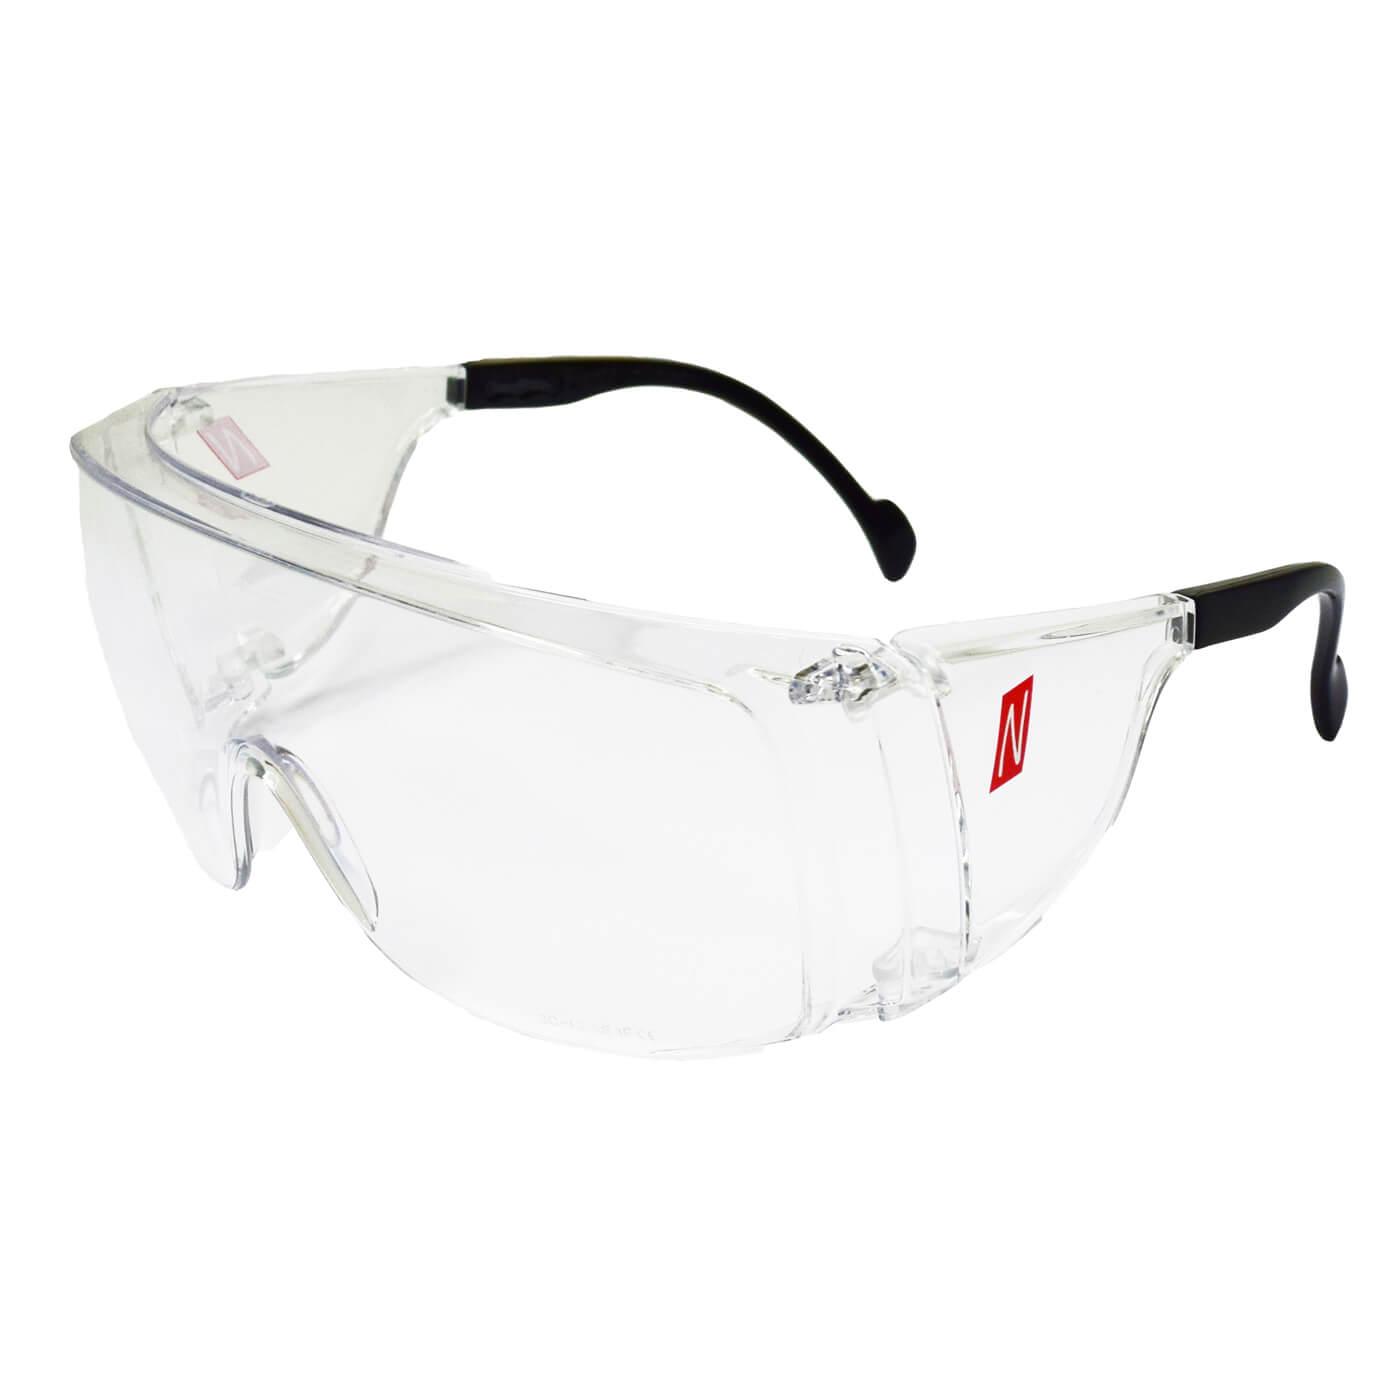 Okulary ochronne Nitras 9015